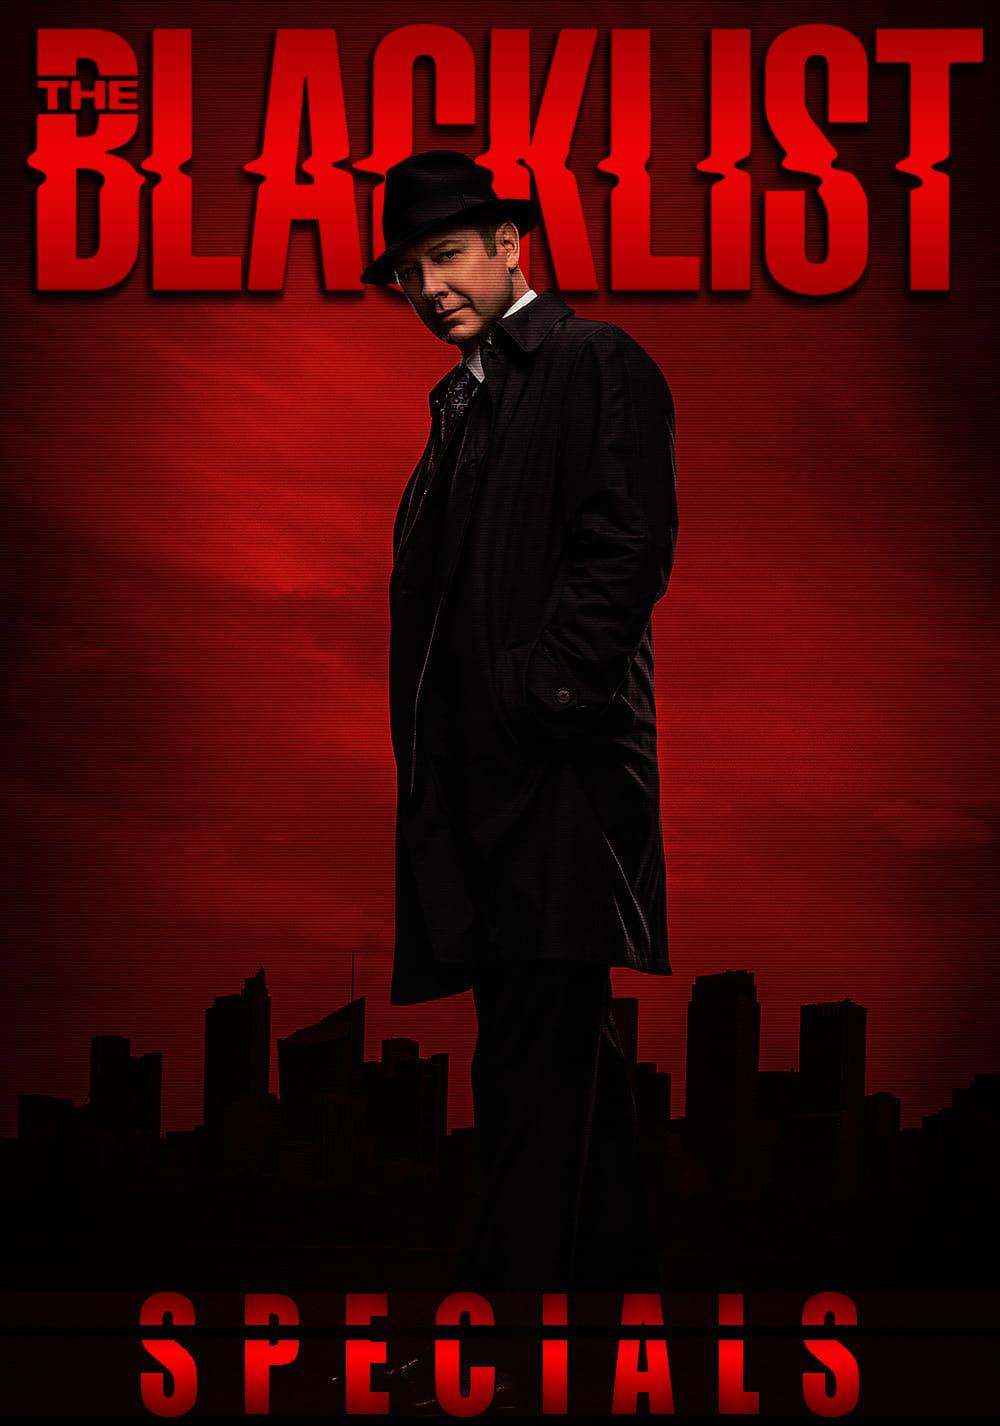 The Blacklist Season 0